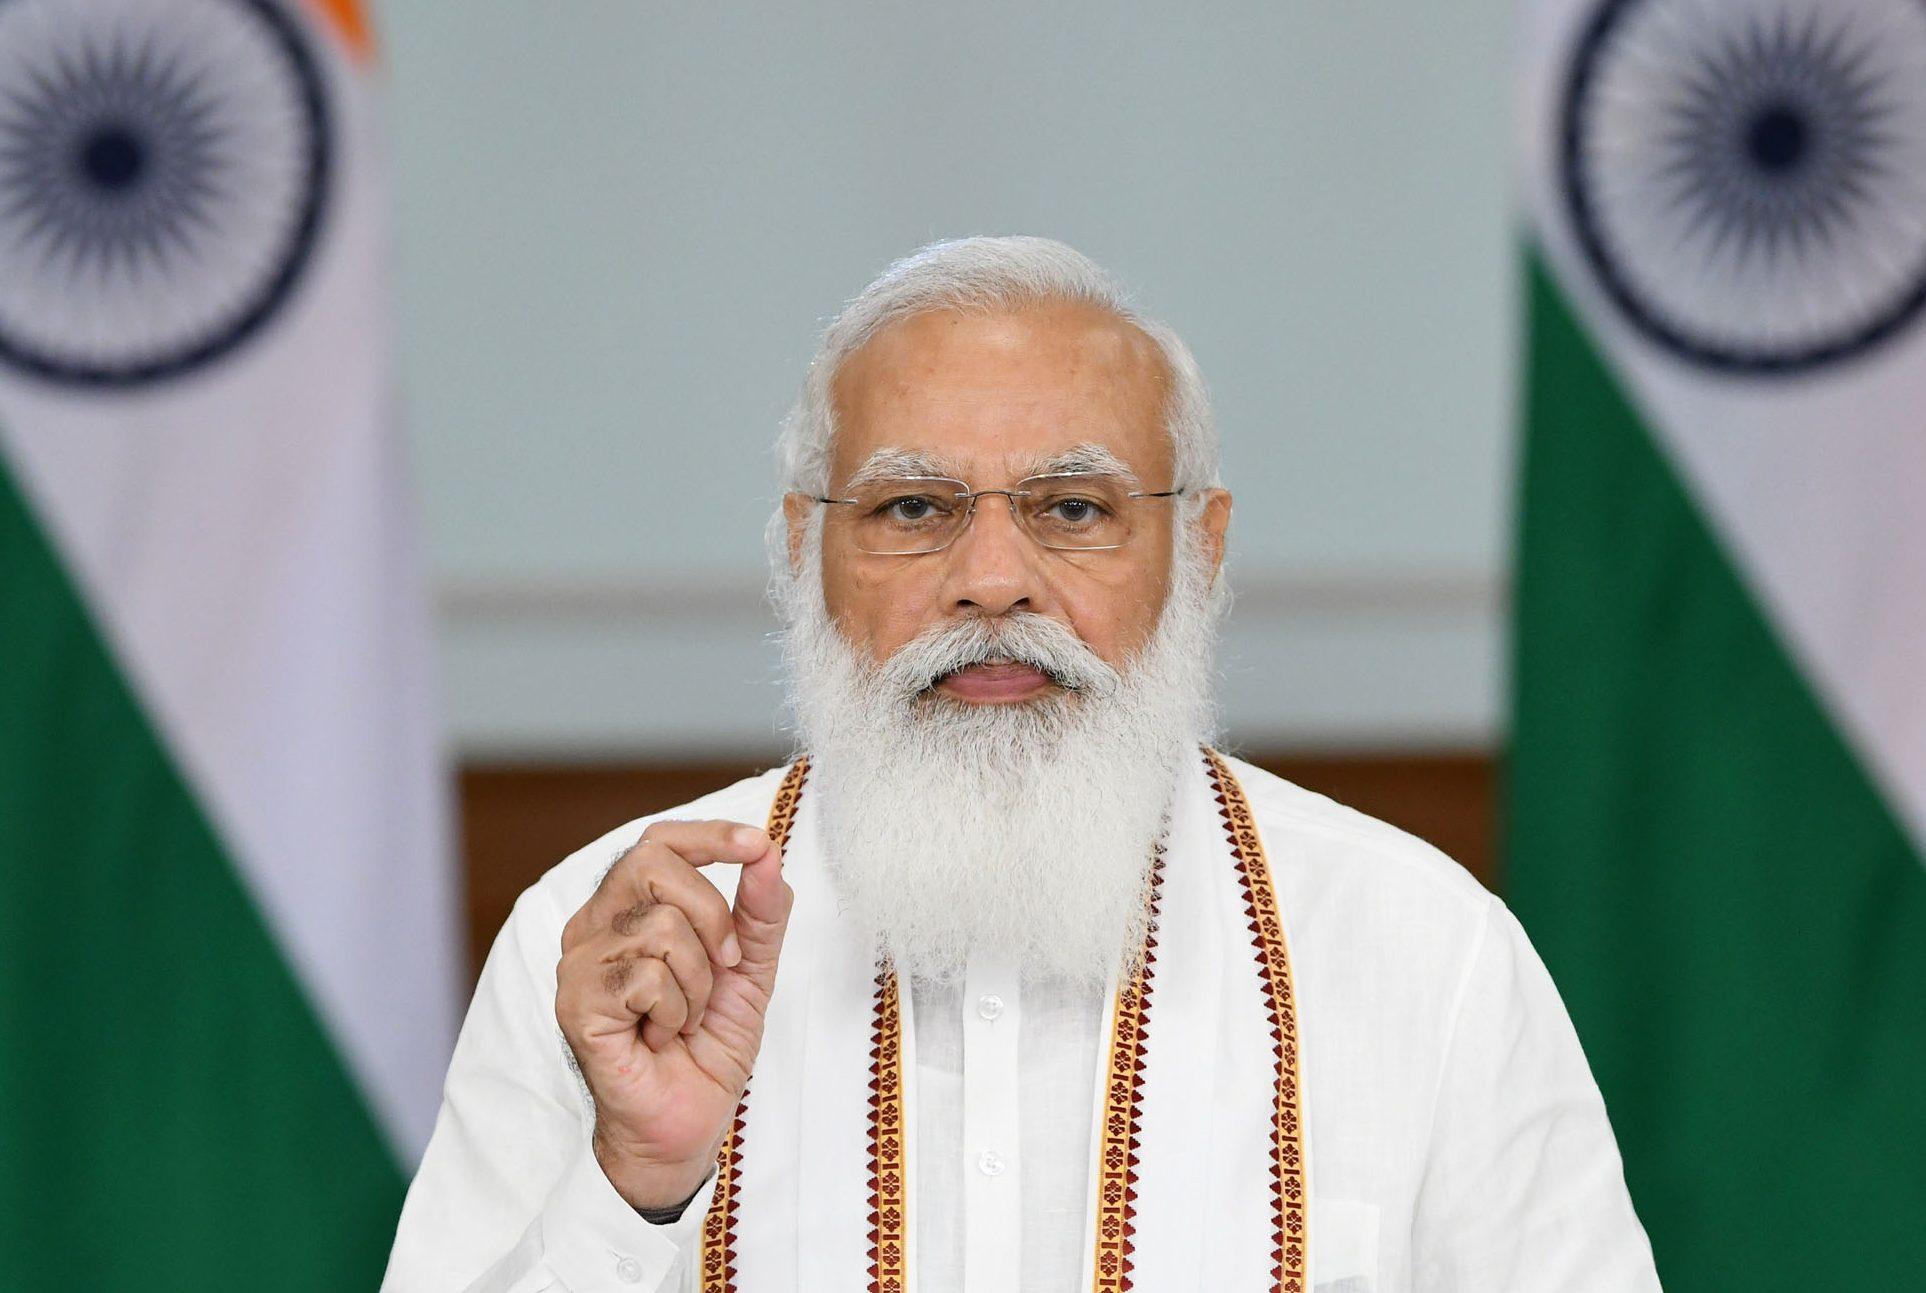 The Prime Minister, Shri Narendra Modi addressing at Ashadha Purnima-Dhamma Chakra Day programme, through video conferencing, in New Delhi on July 24, 2021.